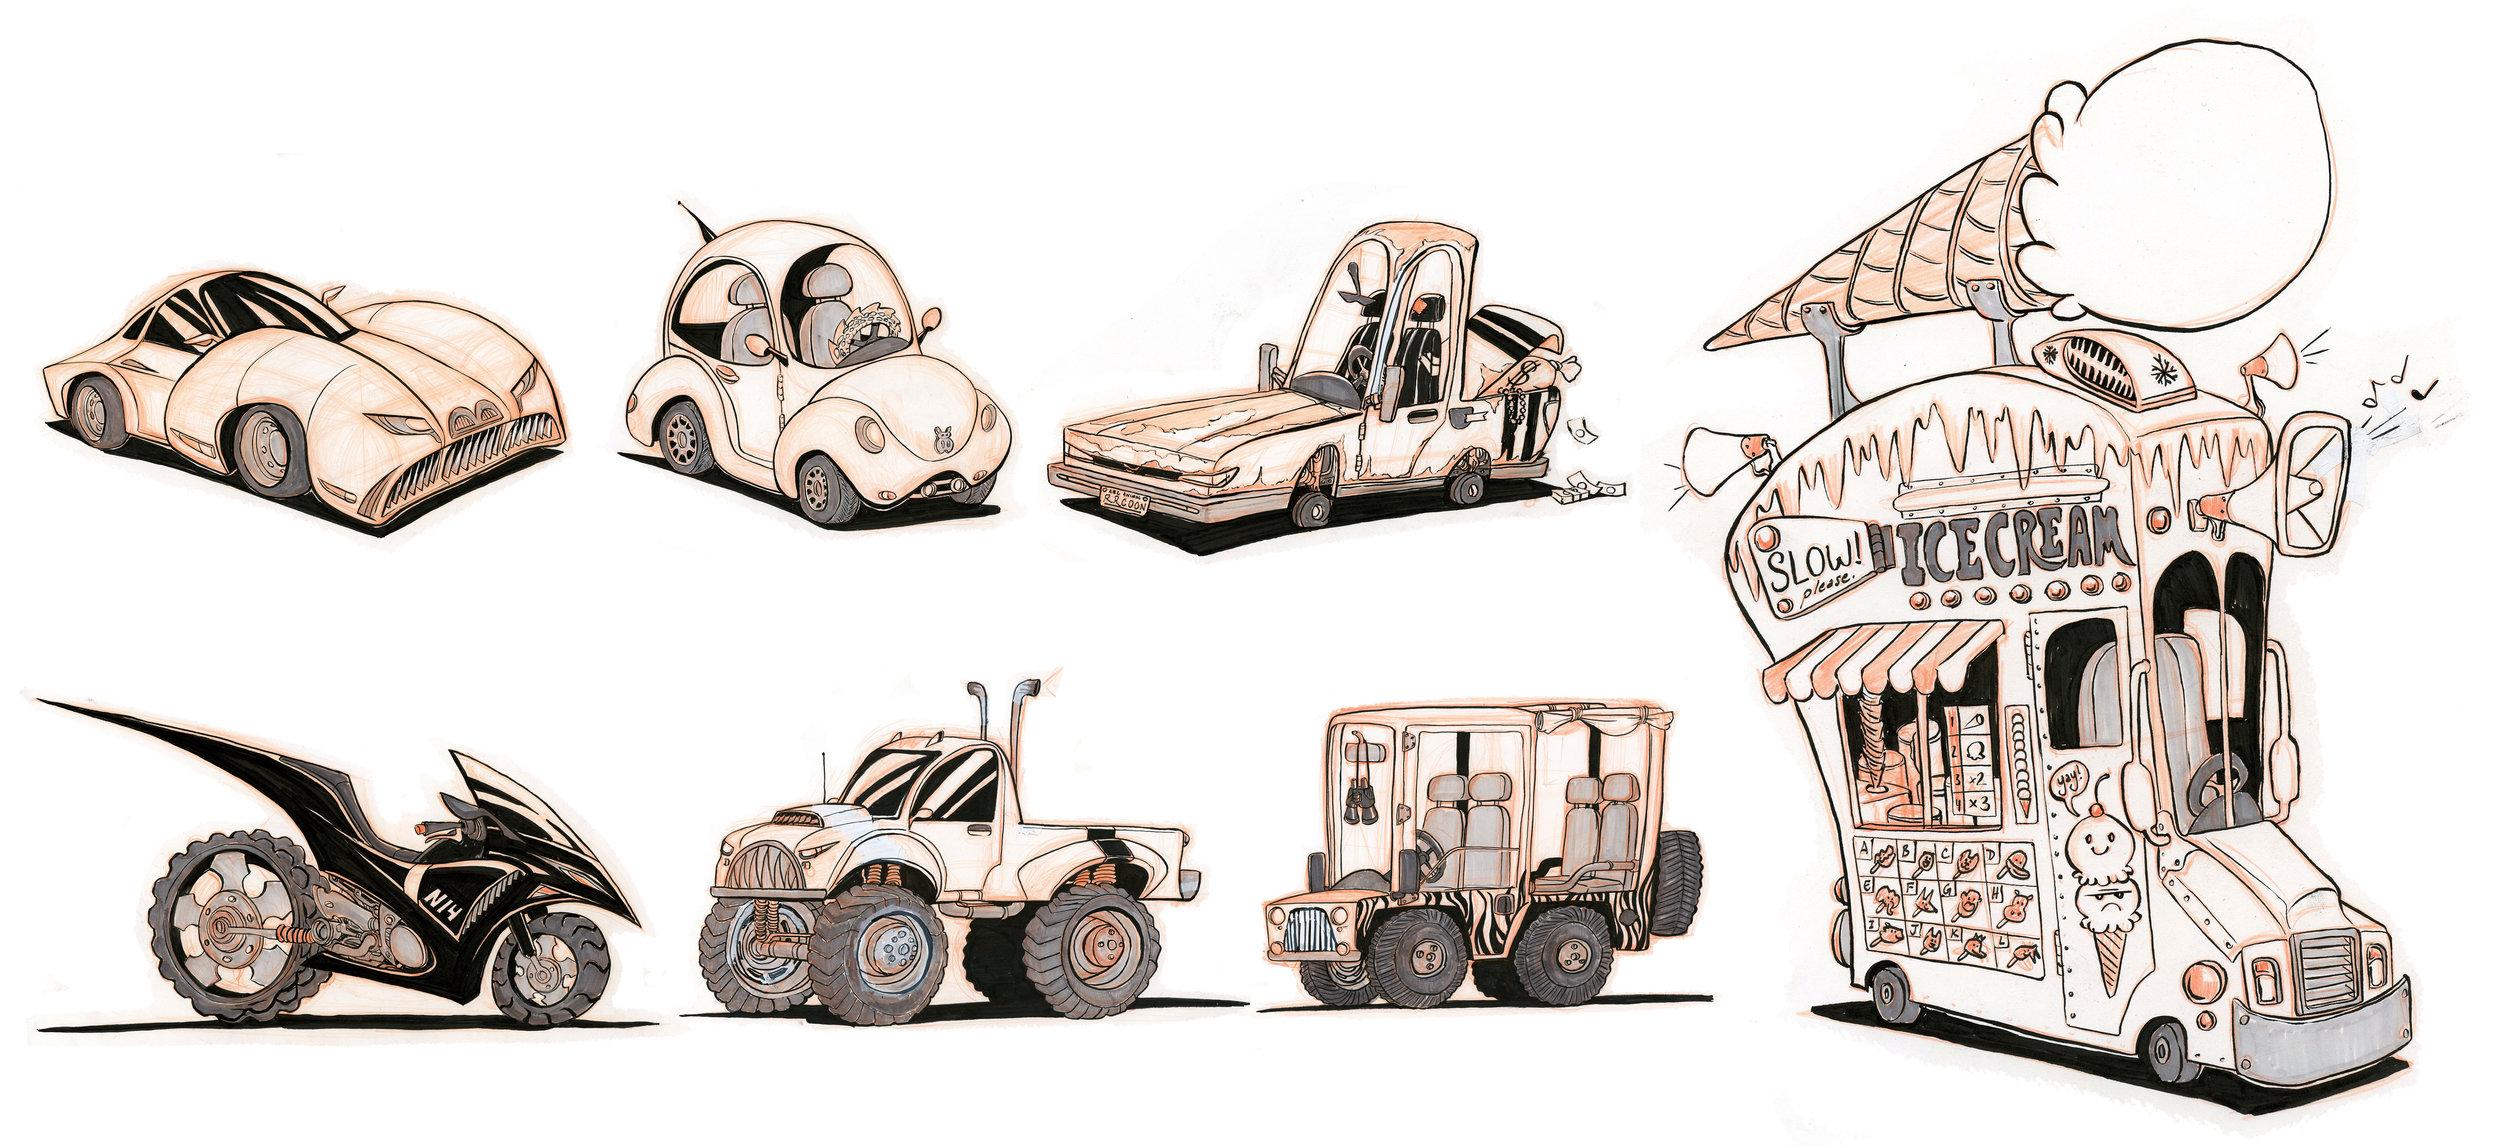 ABC_Vehicles_004.jpg